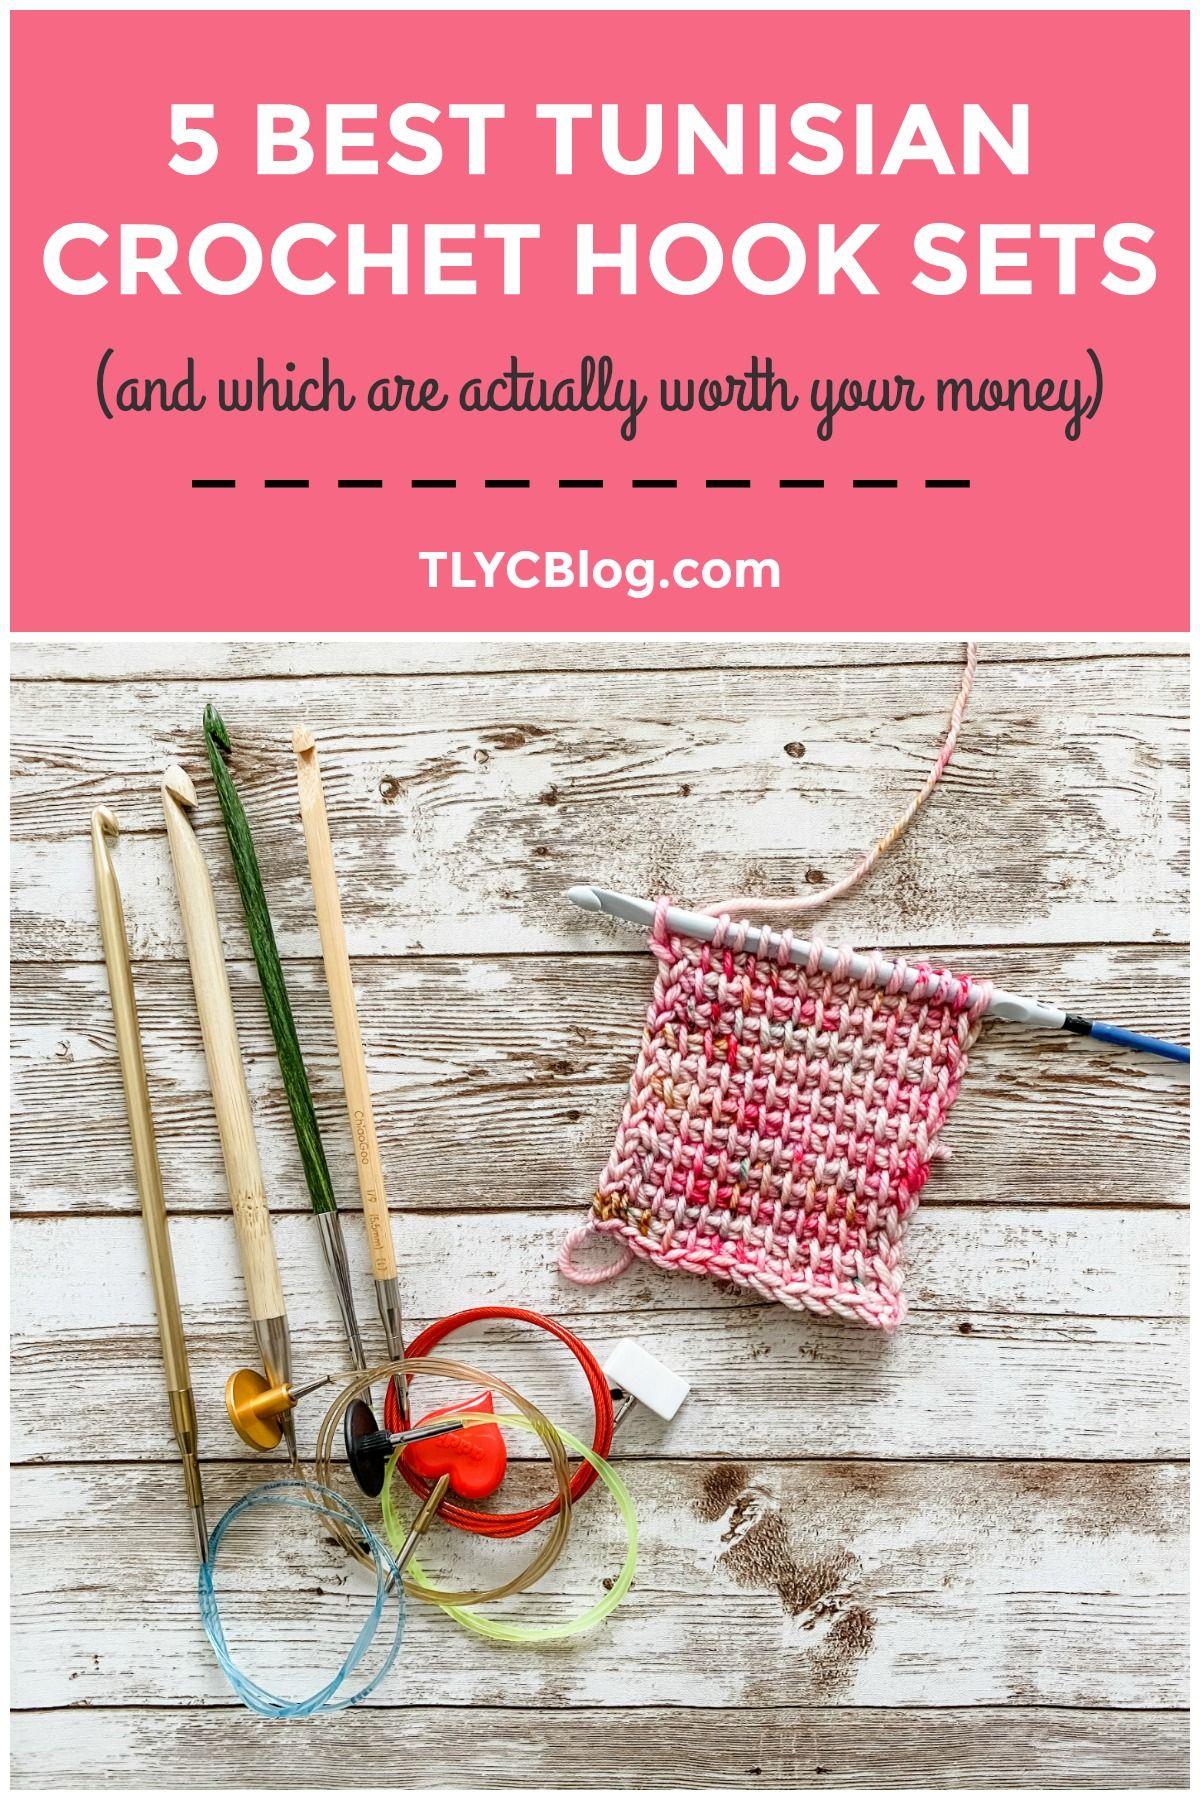 Top 5 Tunisian Crochet Hook Sets - TL Yarn Crafts